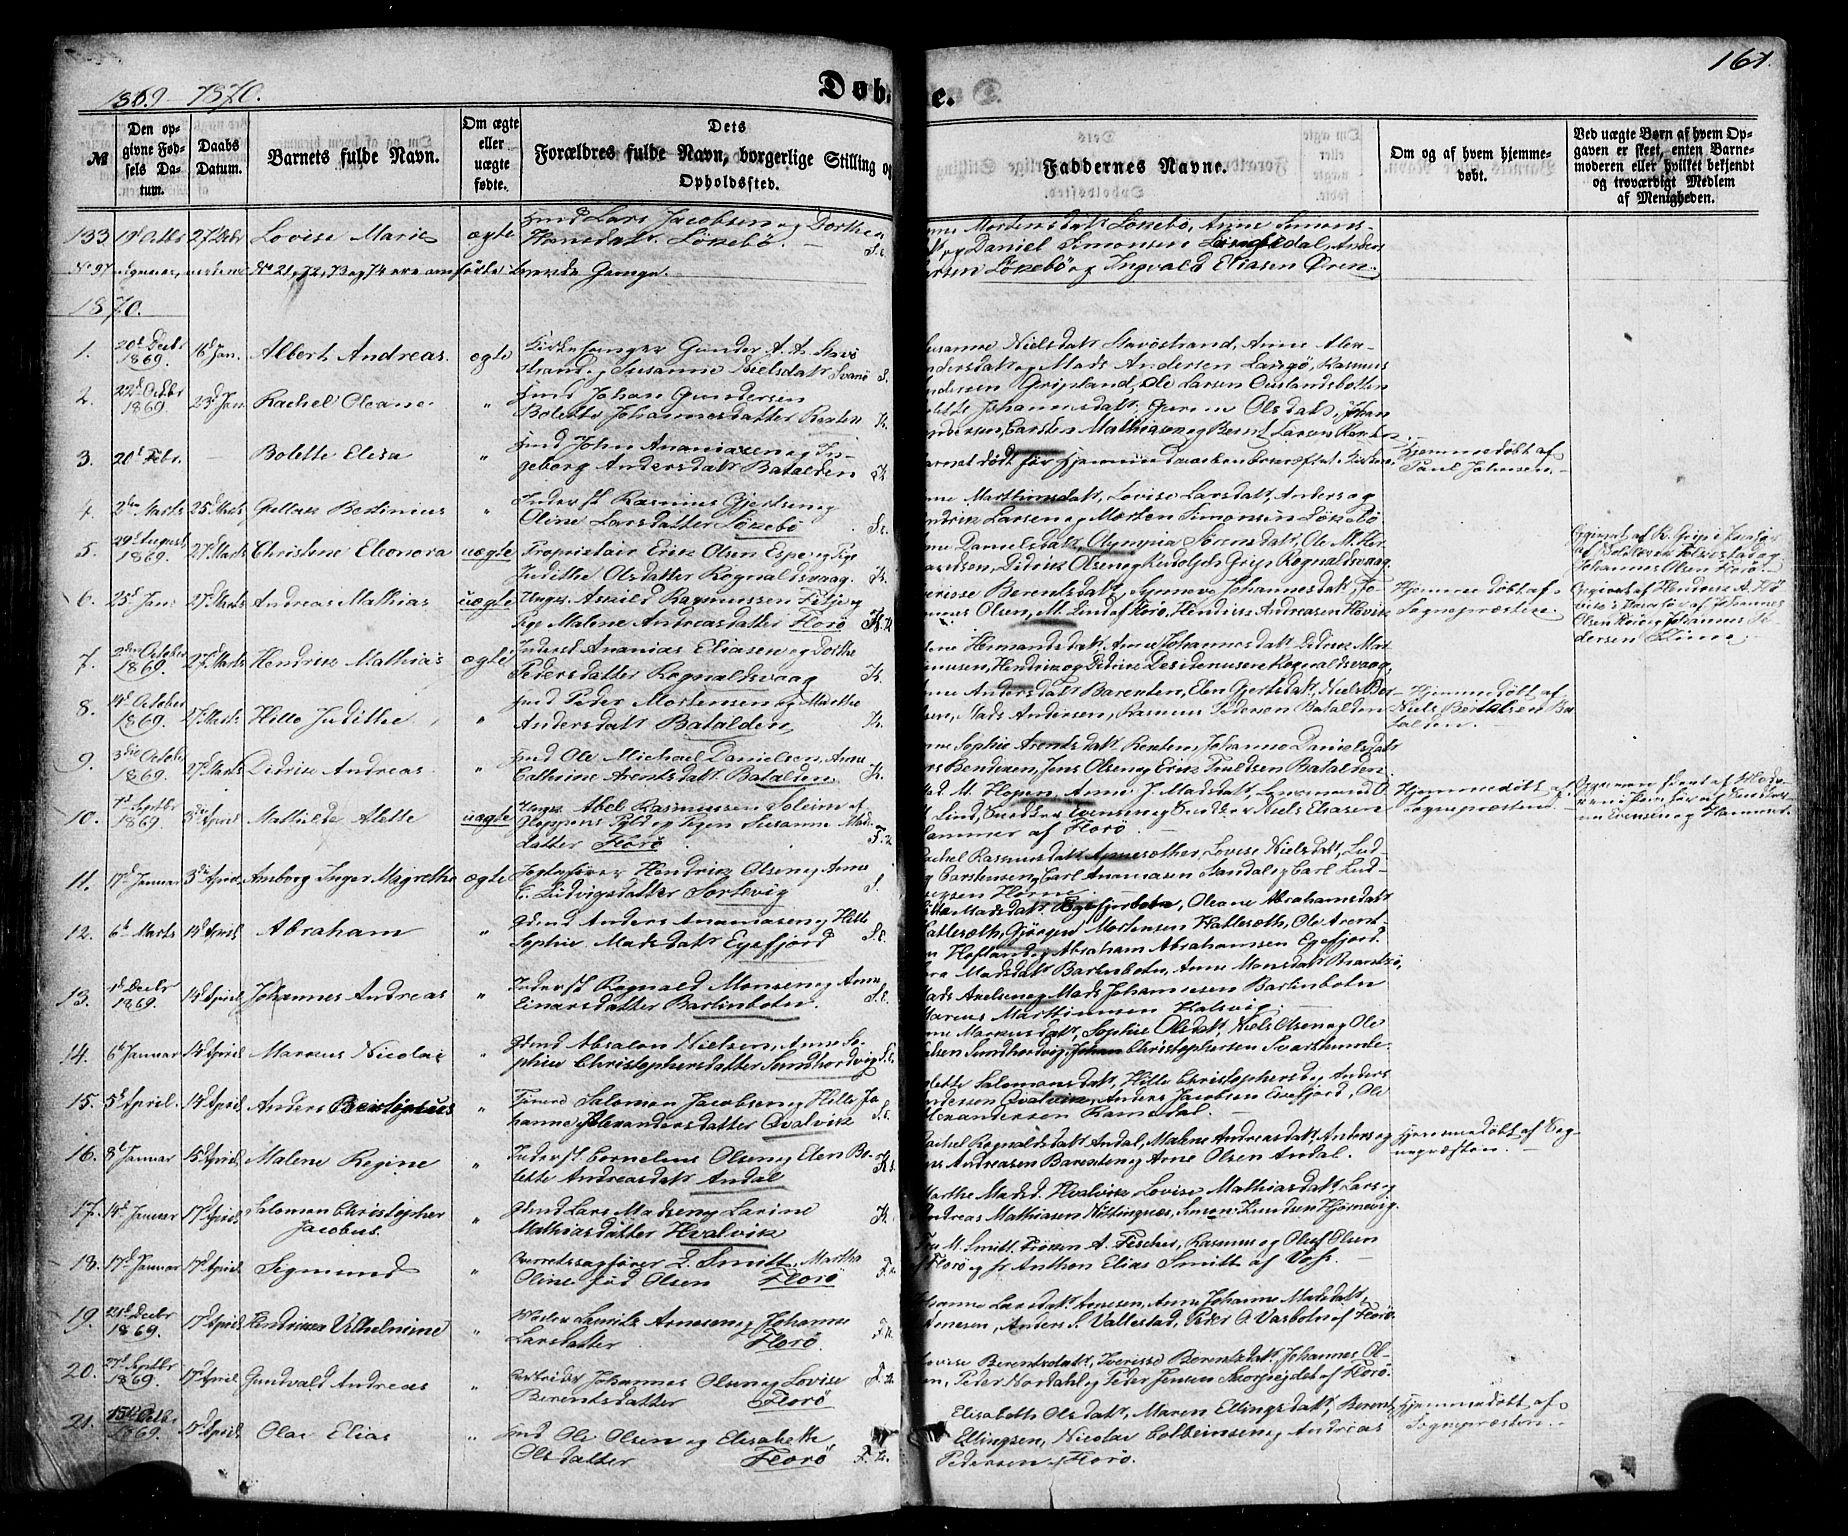 SAB, Kinn sokneprestembete, H/Haa/Haaa/L0006: Ministerialbok nr. A 6, 1857-1885, s. 161